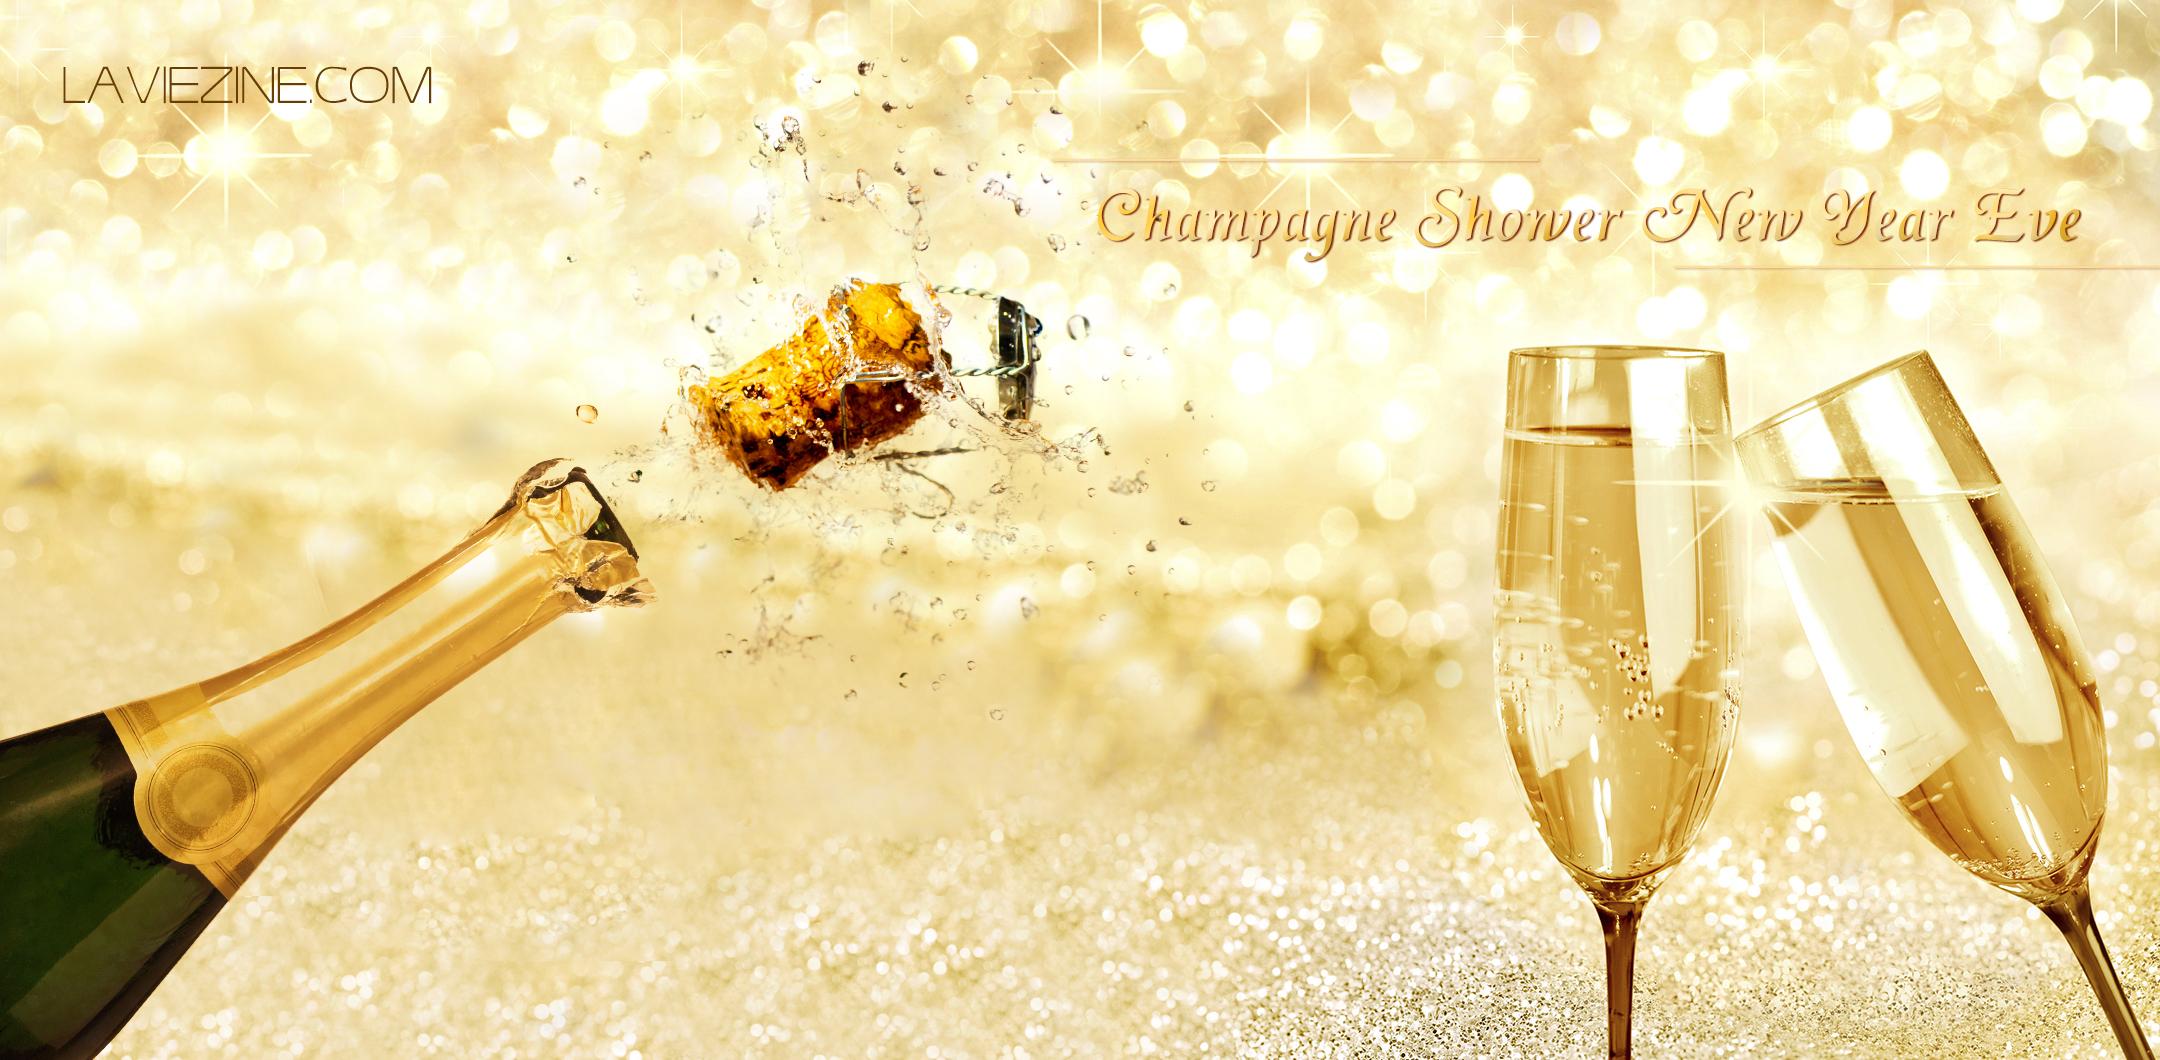 Iphone Wallpaper Reddit Champagne Shower New Year Eve La Vie Zine